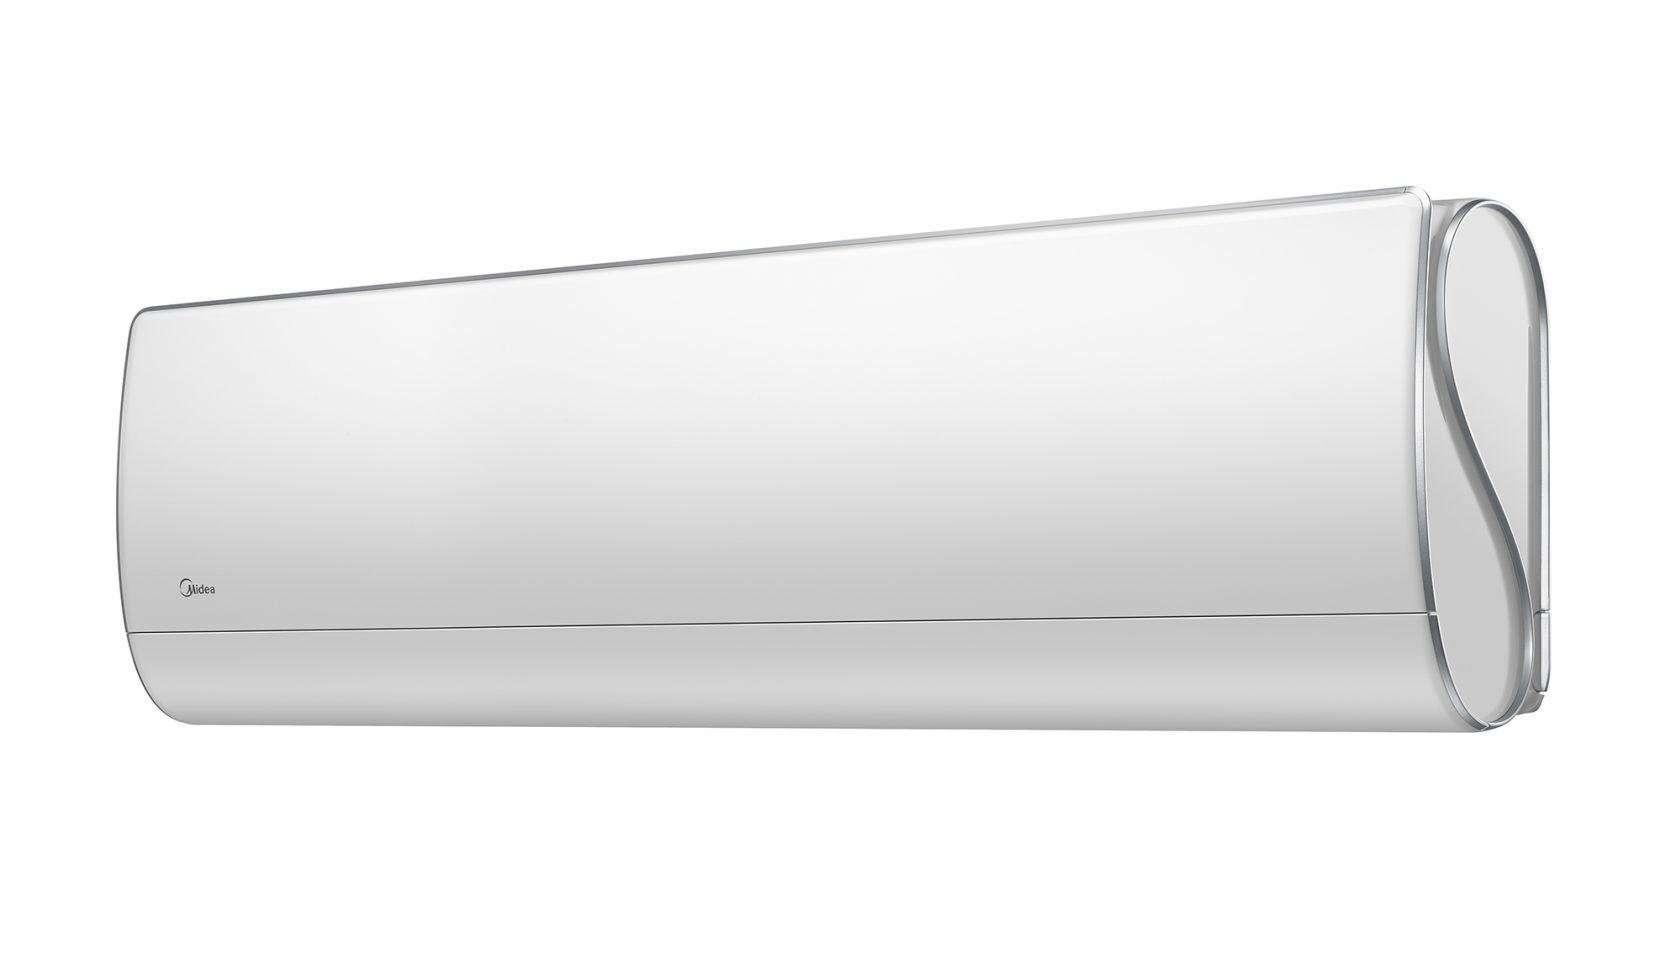 MIDEA Split AC 1.5TR – MST4MT1-18HRFN1-INV